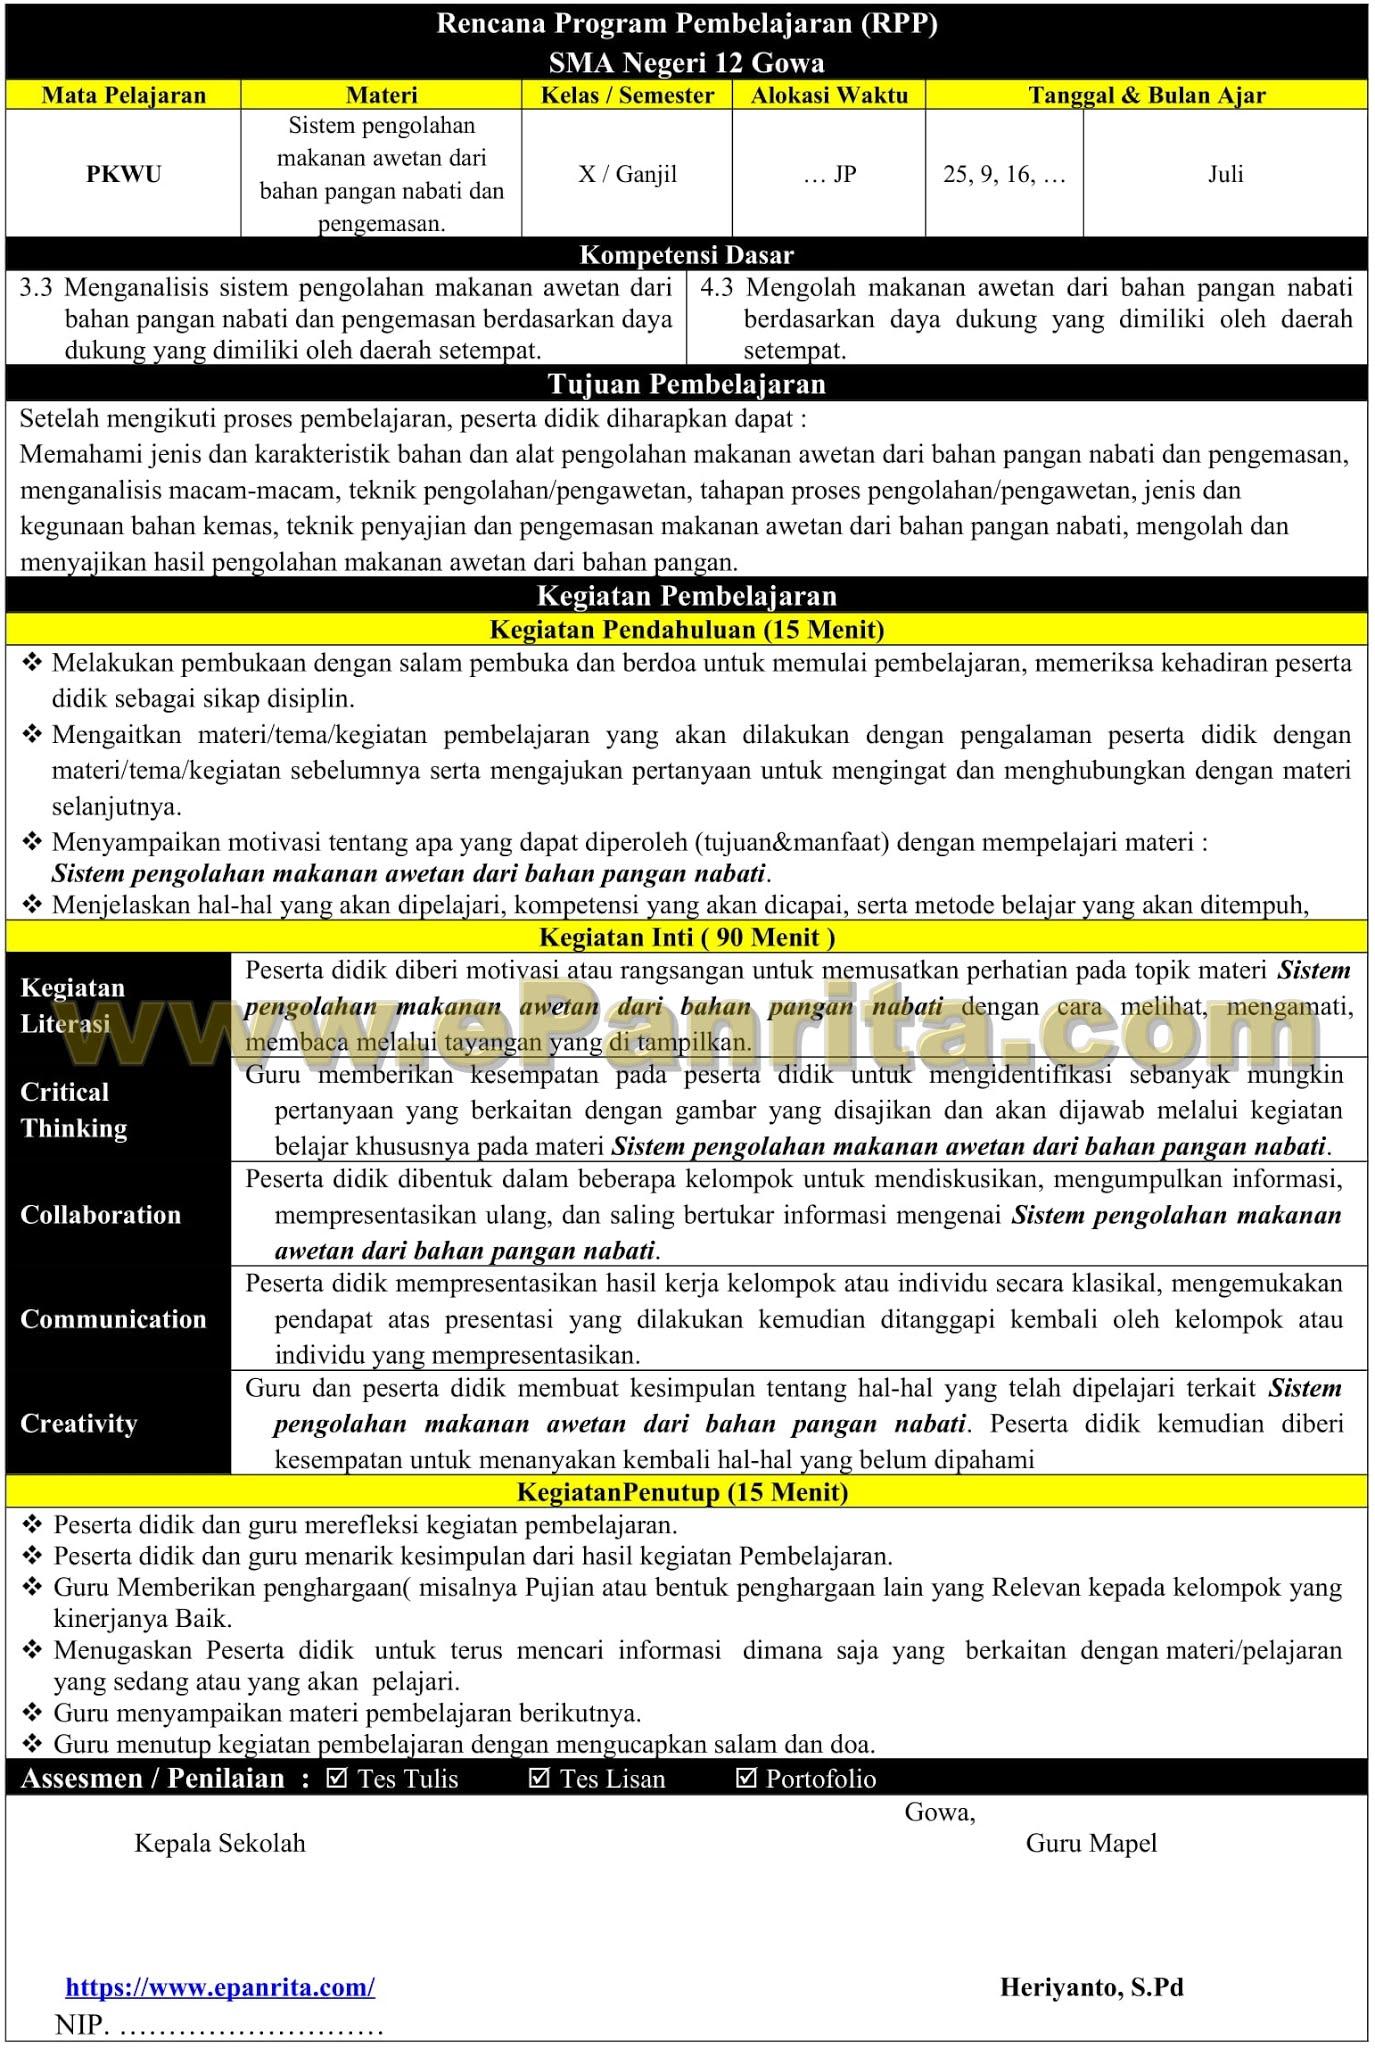 RPP 1 Halaman Prakarya Aspek Pengolahan (Sistem pengolahan makanan awetan dari bahan pangan nabati)